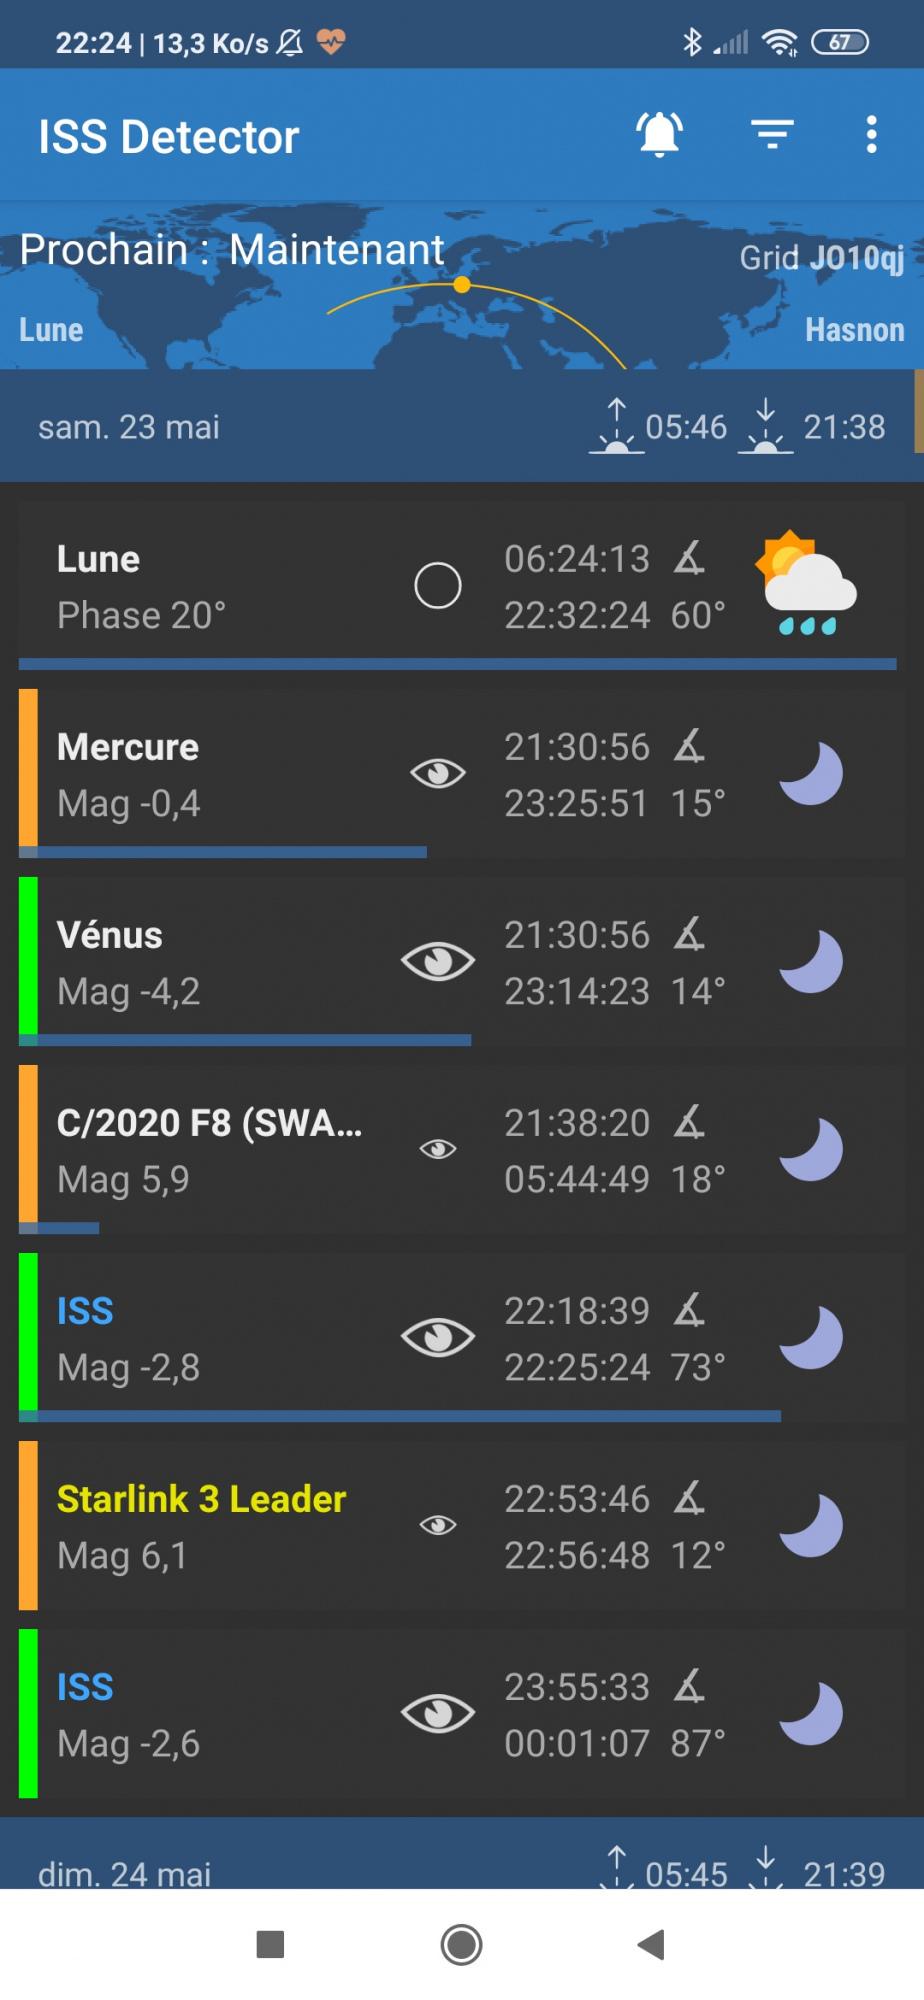 Screenshot_2020-05-23-22-24-28-377_com.runar.issdetector.thumb.jpg.6a93fe0d2ab4f568ca970bae2b35422c.jpg